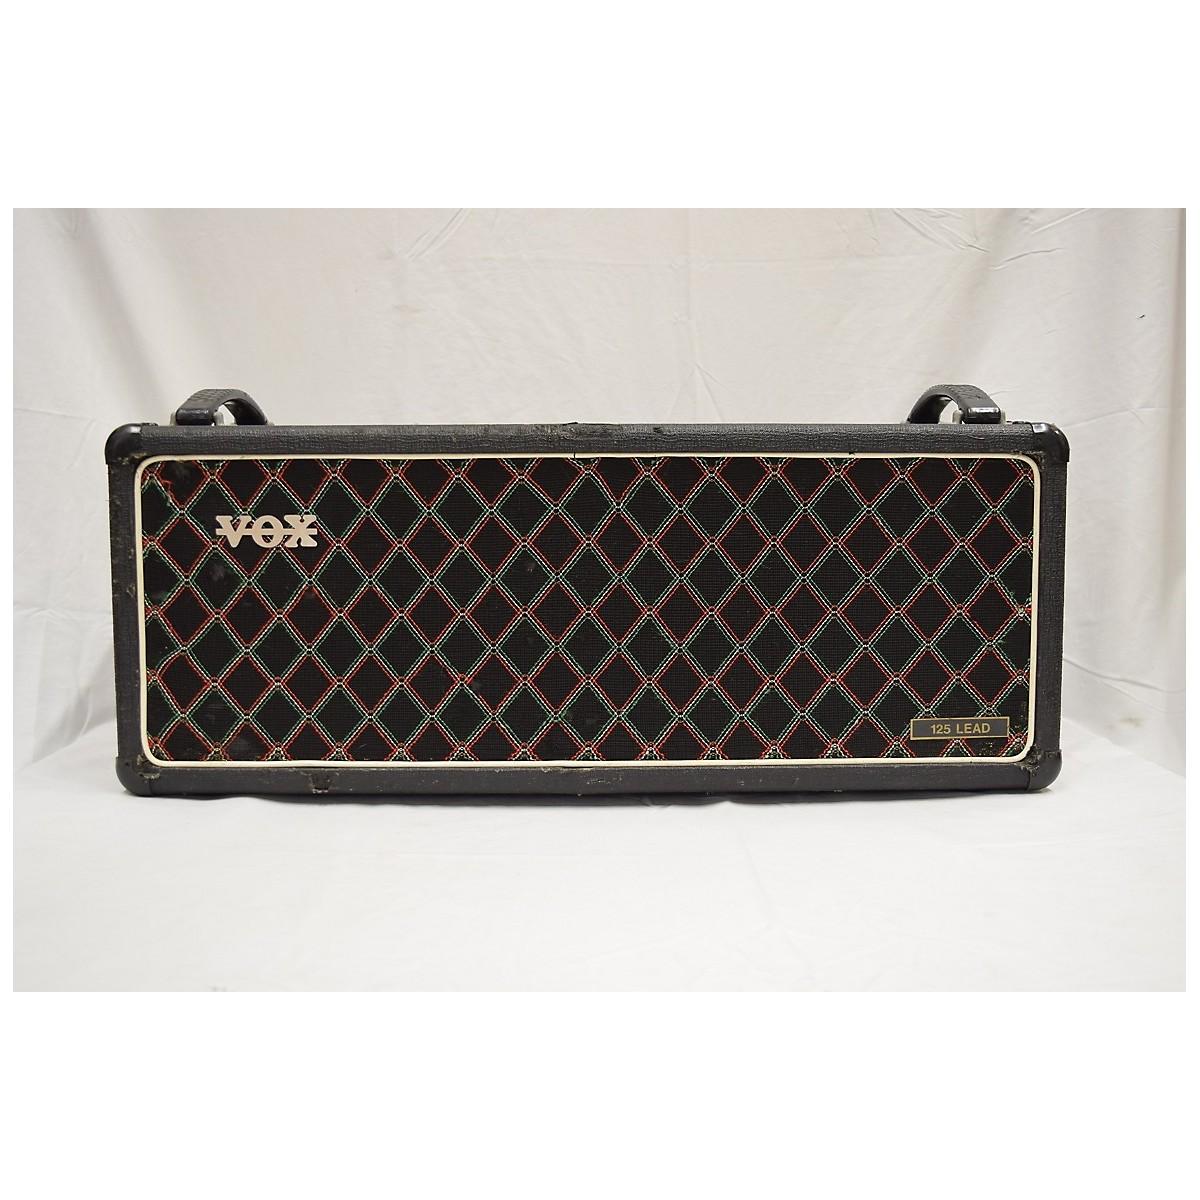 Vox 1970s 125 Lead Tube Guitar Amp Head